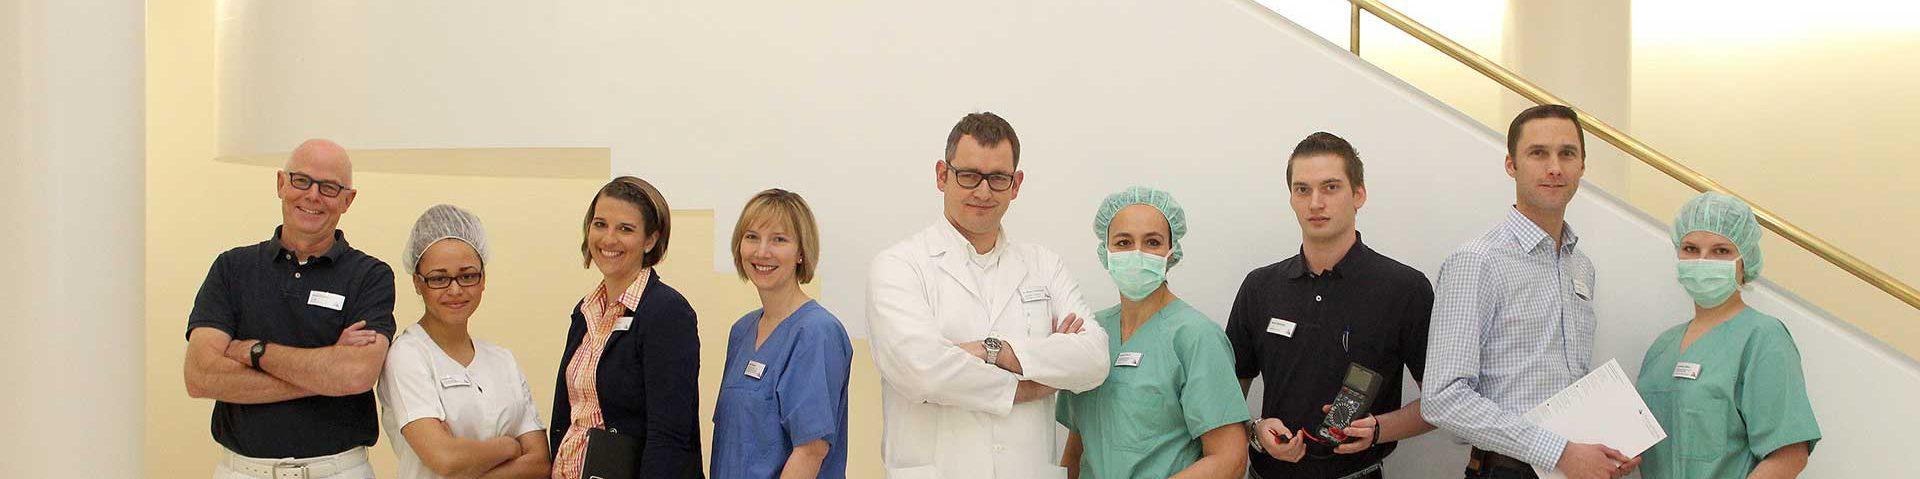 Verschiedene Berufsgruppen in der Christophorus Klinik